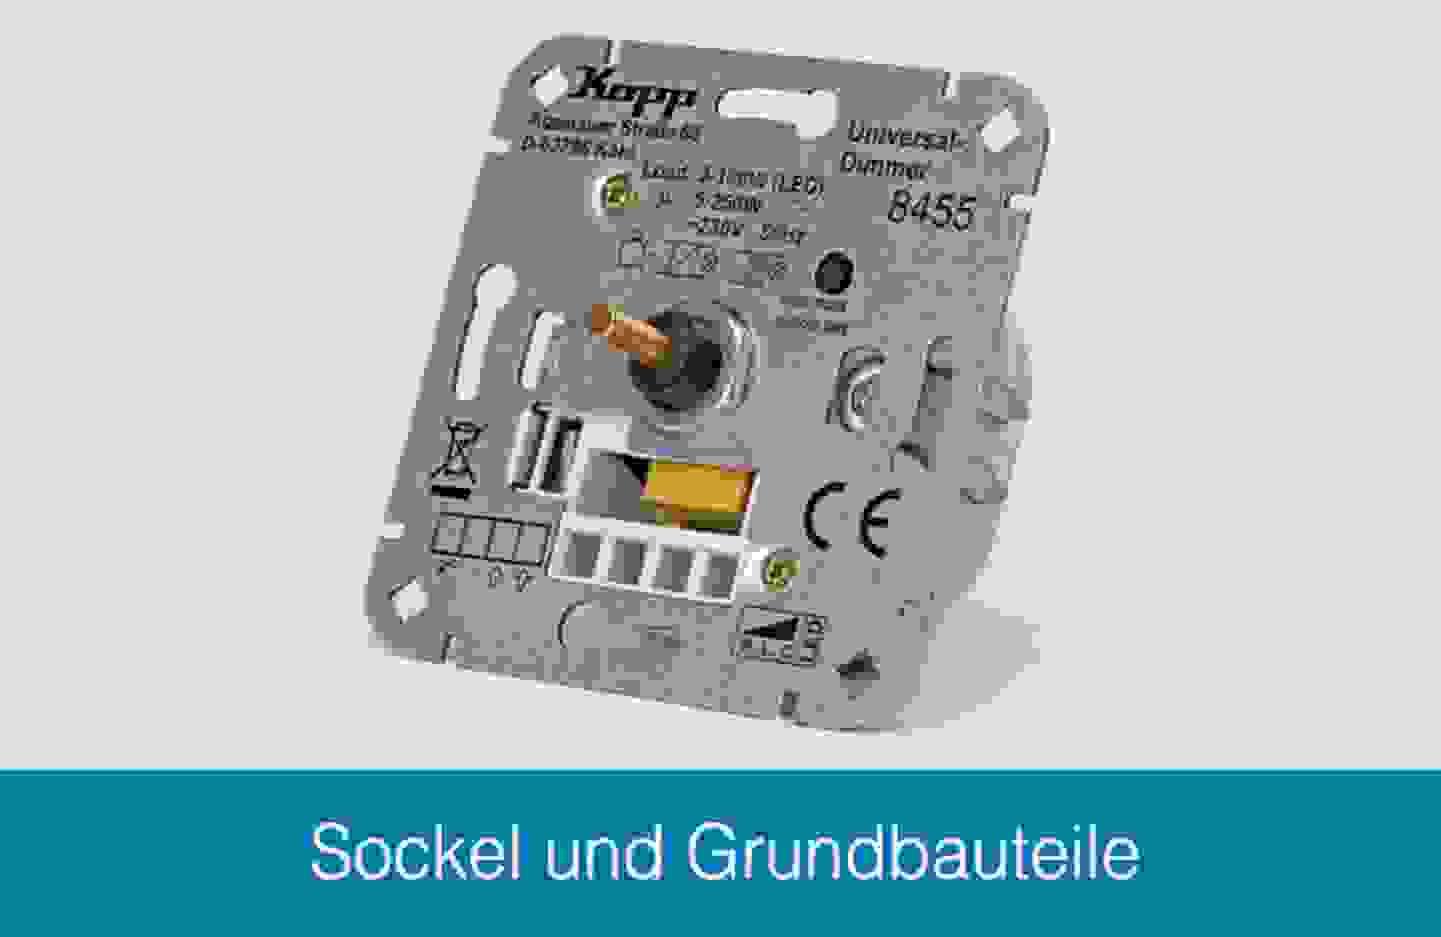 Kopp Sockel und Grundbauteile